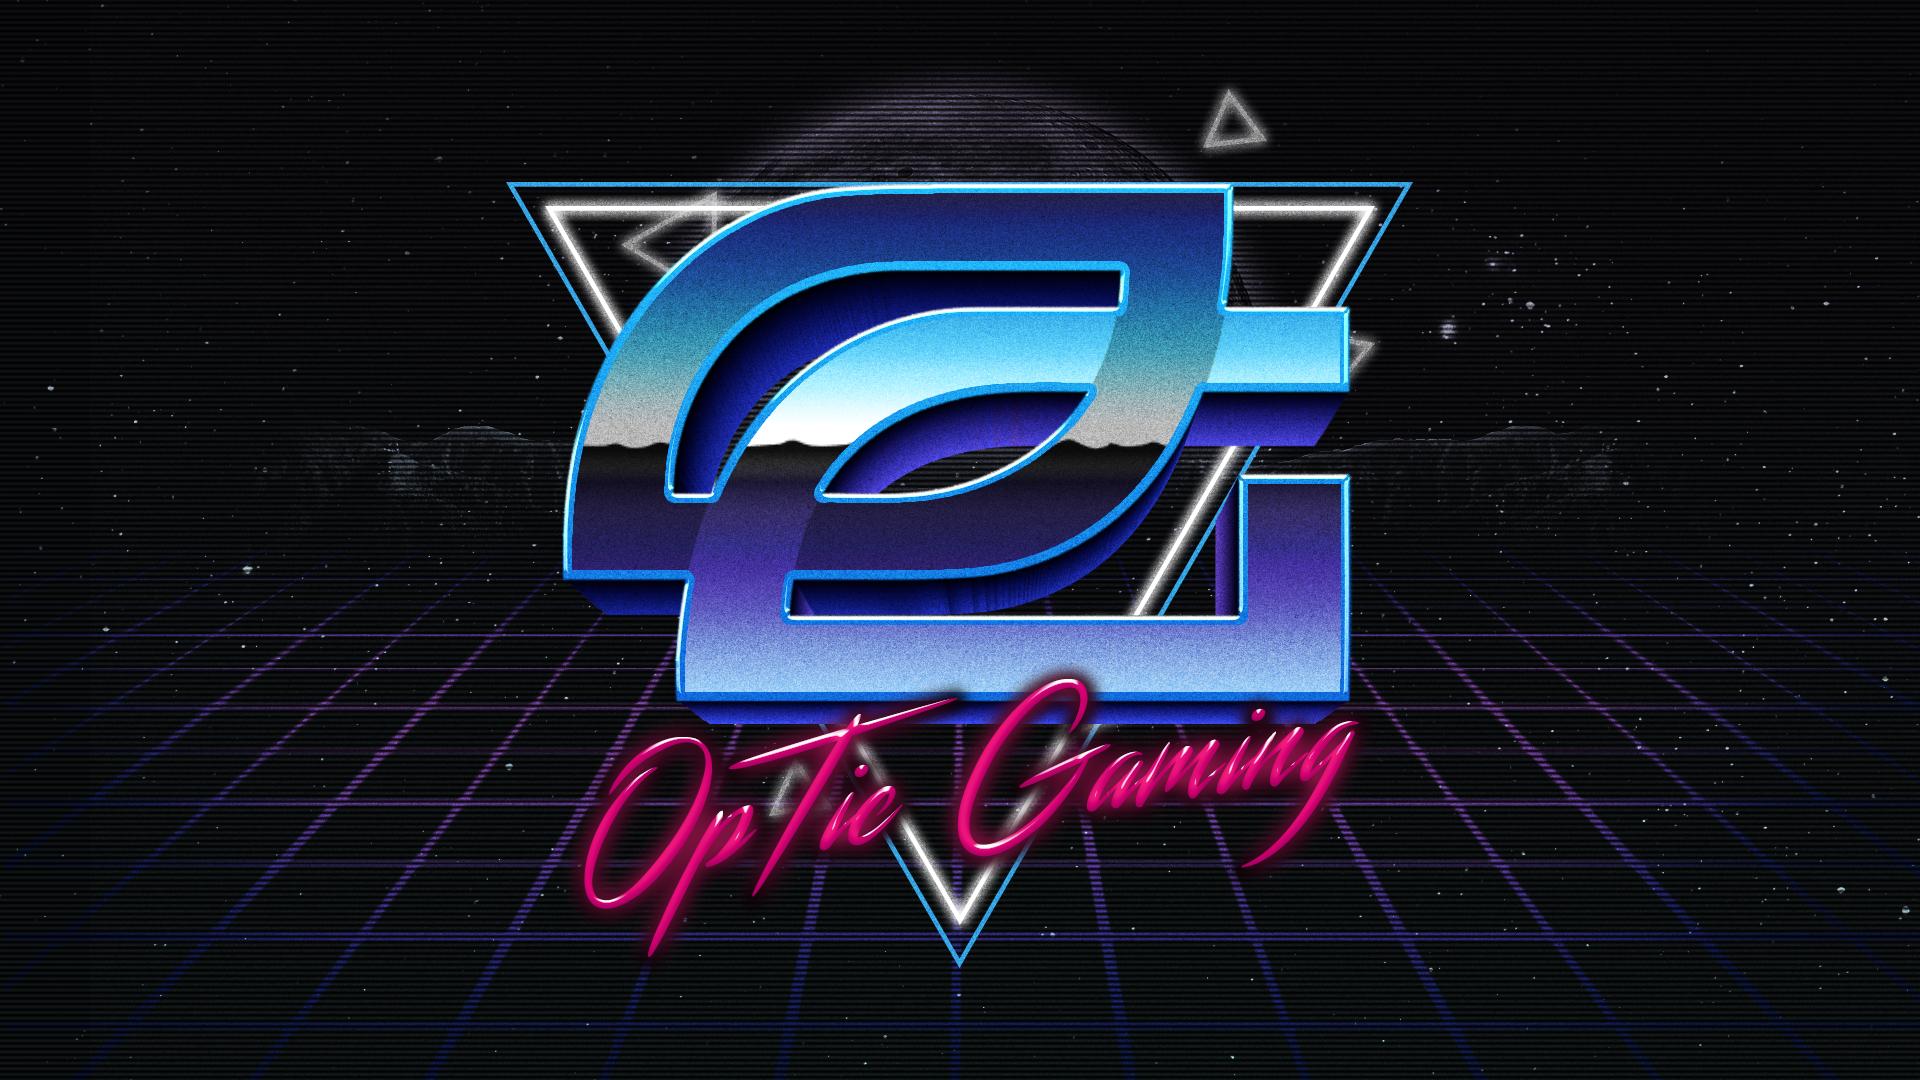 Jasonr To Fill In For Optic Gaming Cs Go Http Htl Li 5hyi30anjpl Optic Gaming Optical Gaming Wallpapers